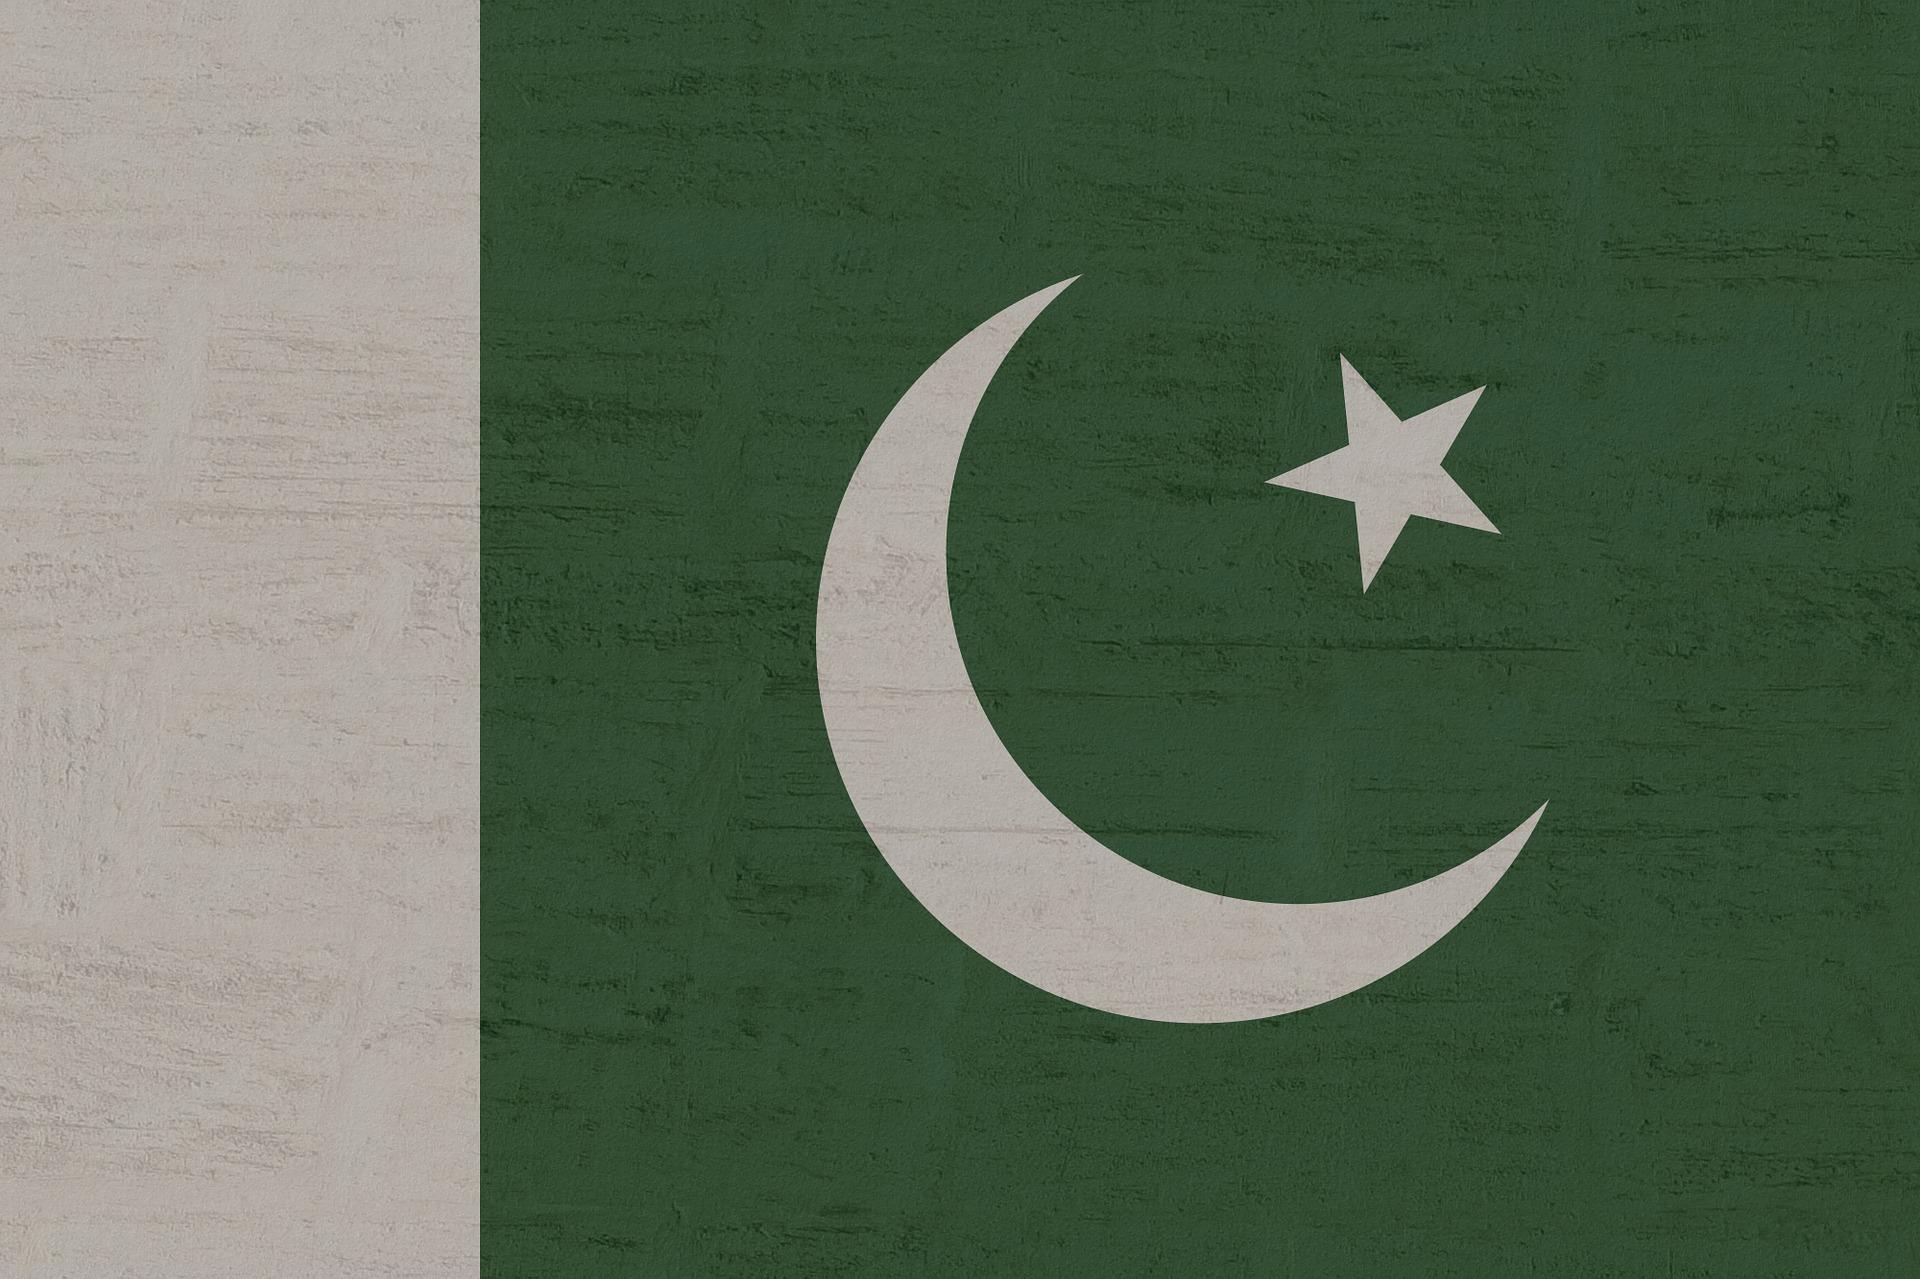 Europe pressures Pakistan over blasphemy laws